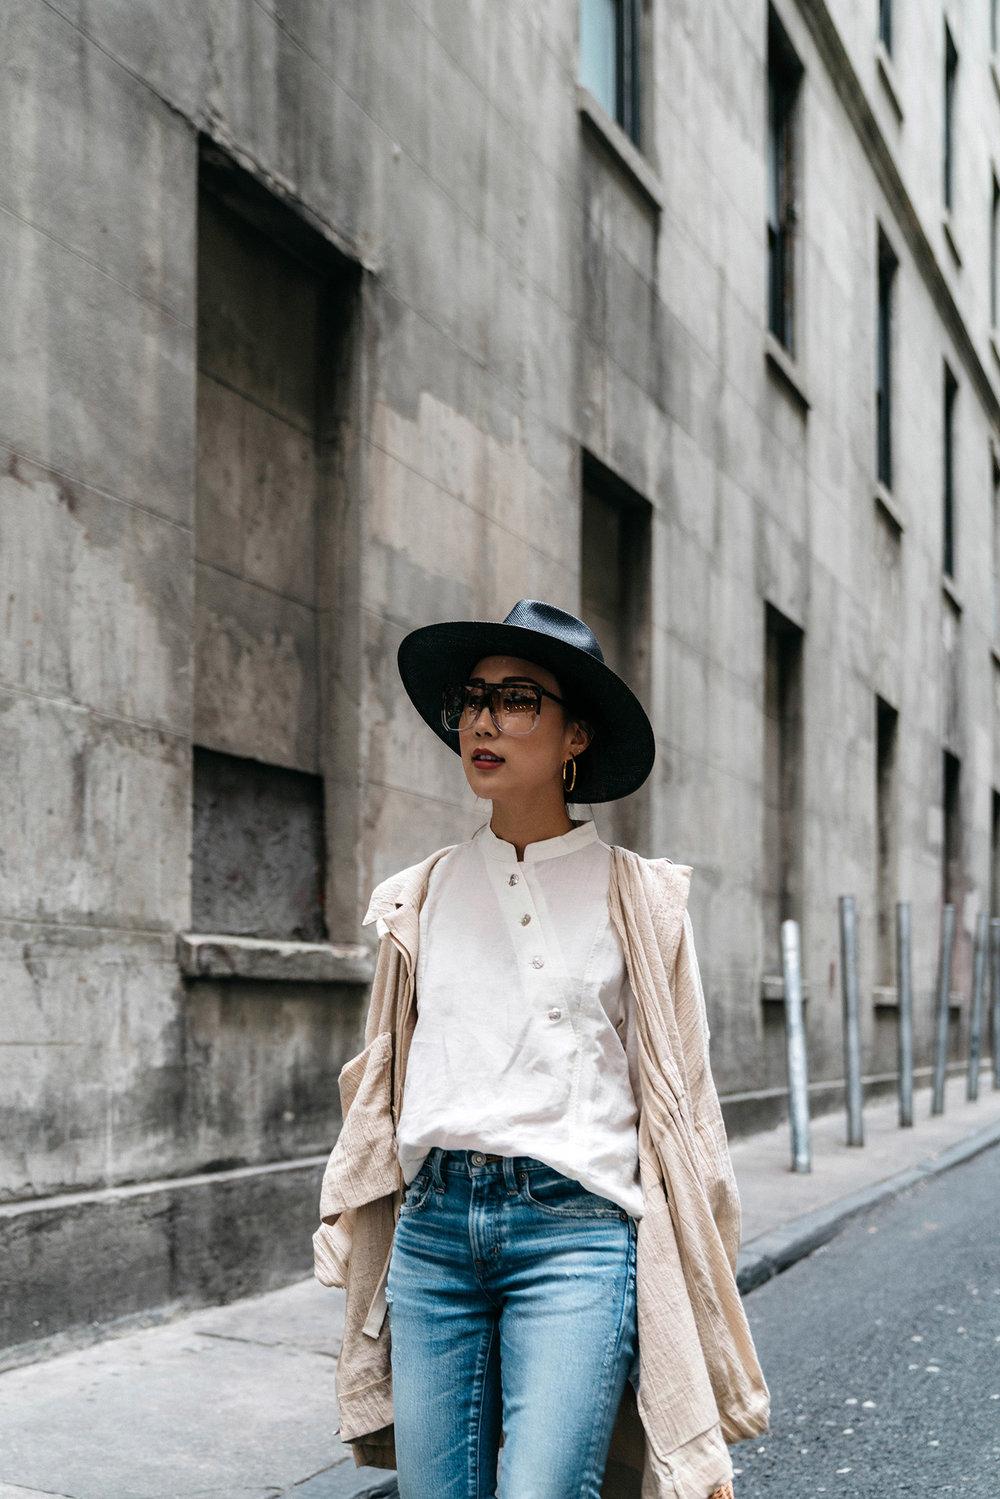 Loewe Jacket, Akro Top, Moussy Denim, Janessa Leone Hat, Vita Fede Earrings